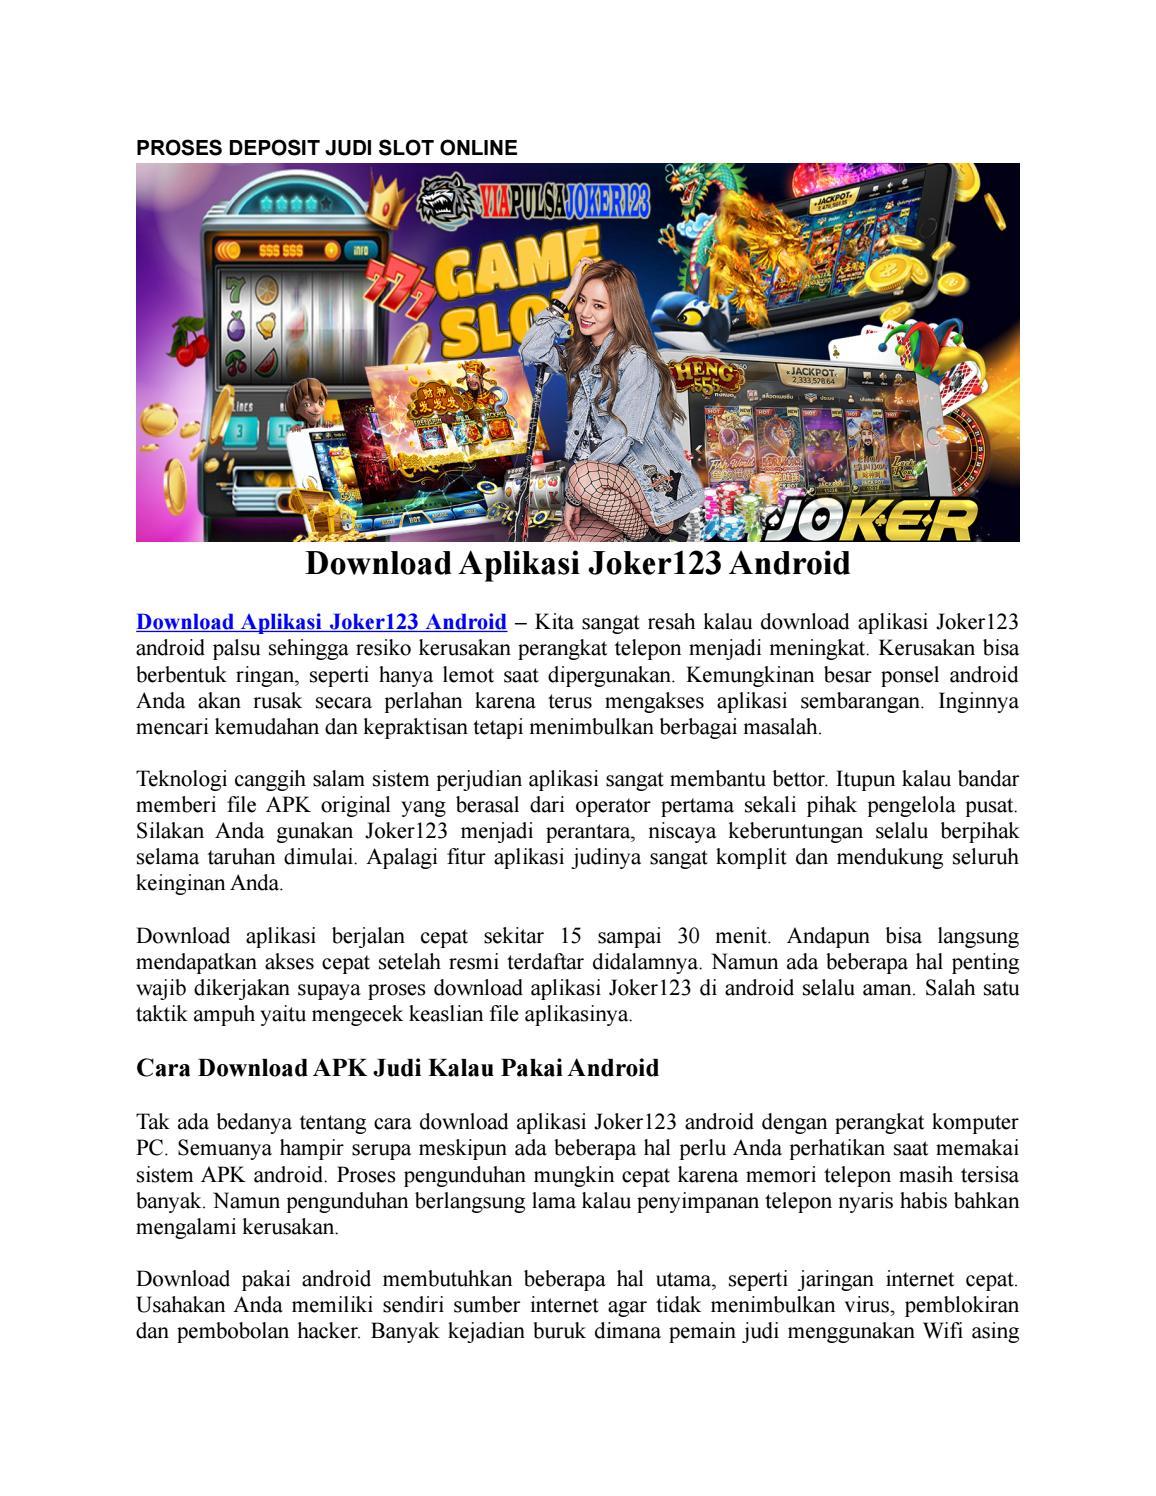 Proses Deposit Judi Slot Online By Viapulsajoker123 Com Issuu